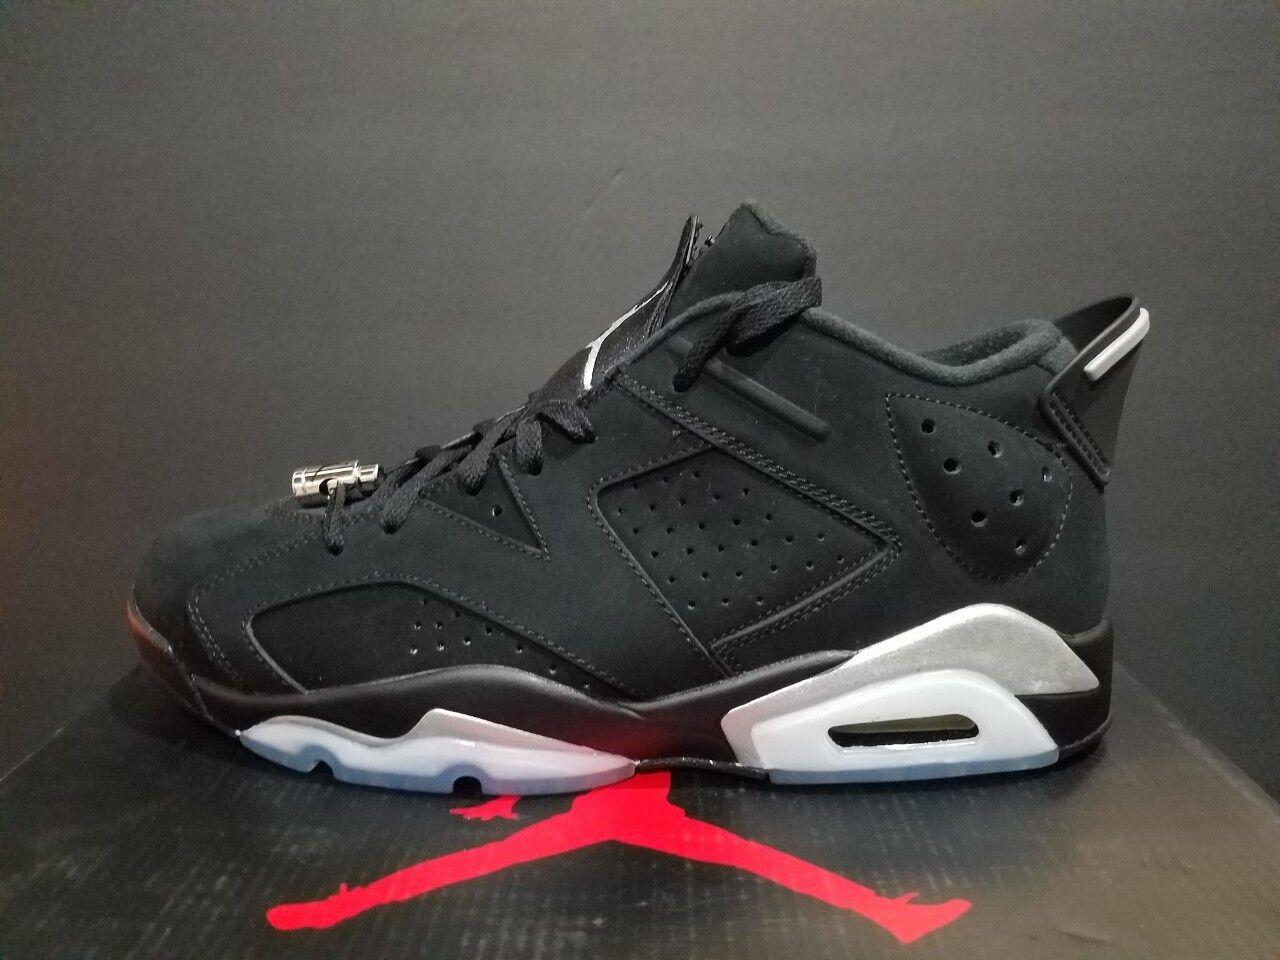 Air Jordan 6 Retro Low Black/Metallic Silver-White 304401 003 The most popular shoes for men and women